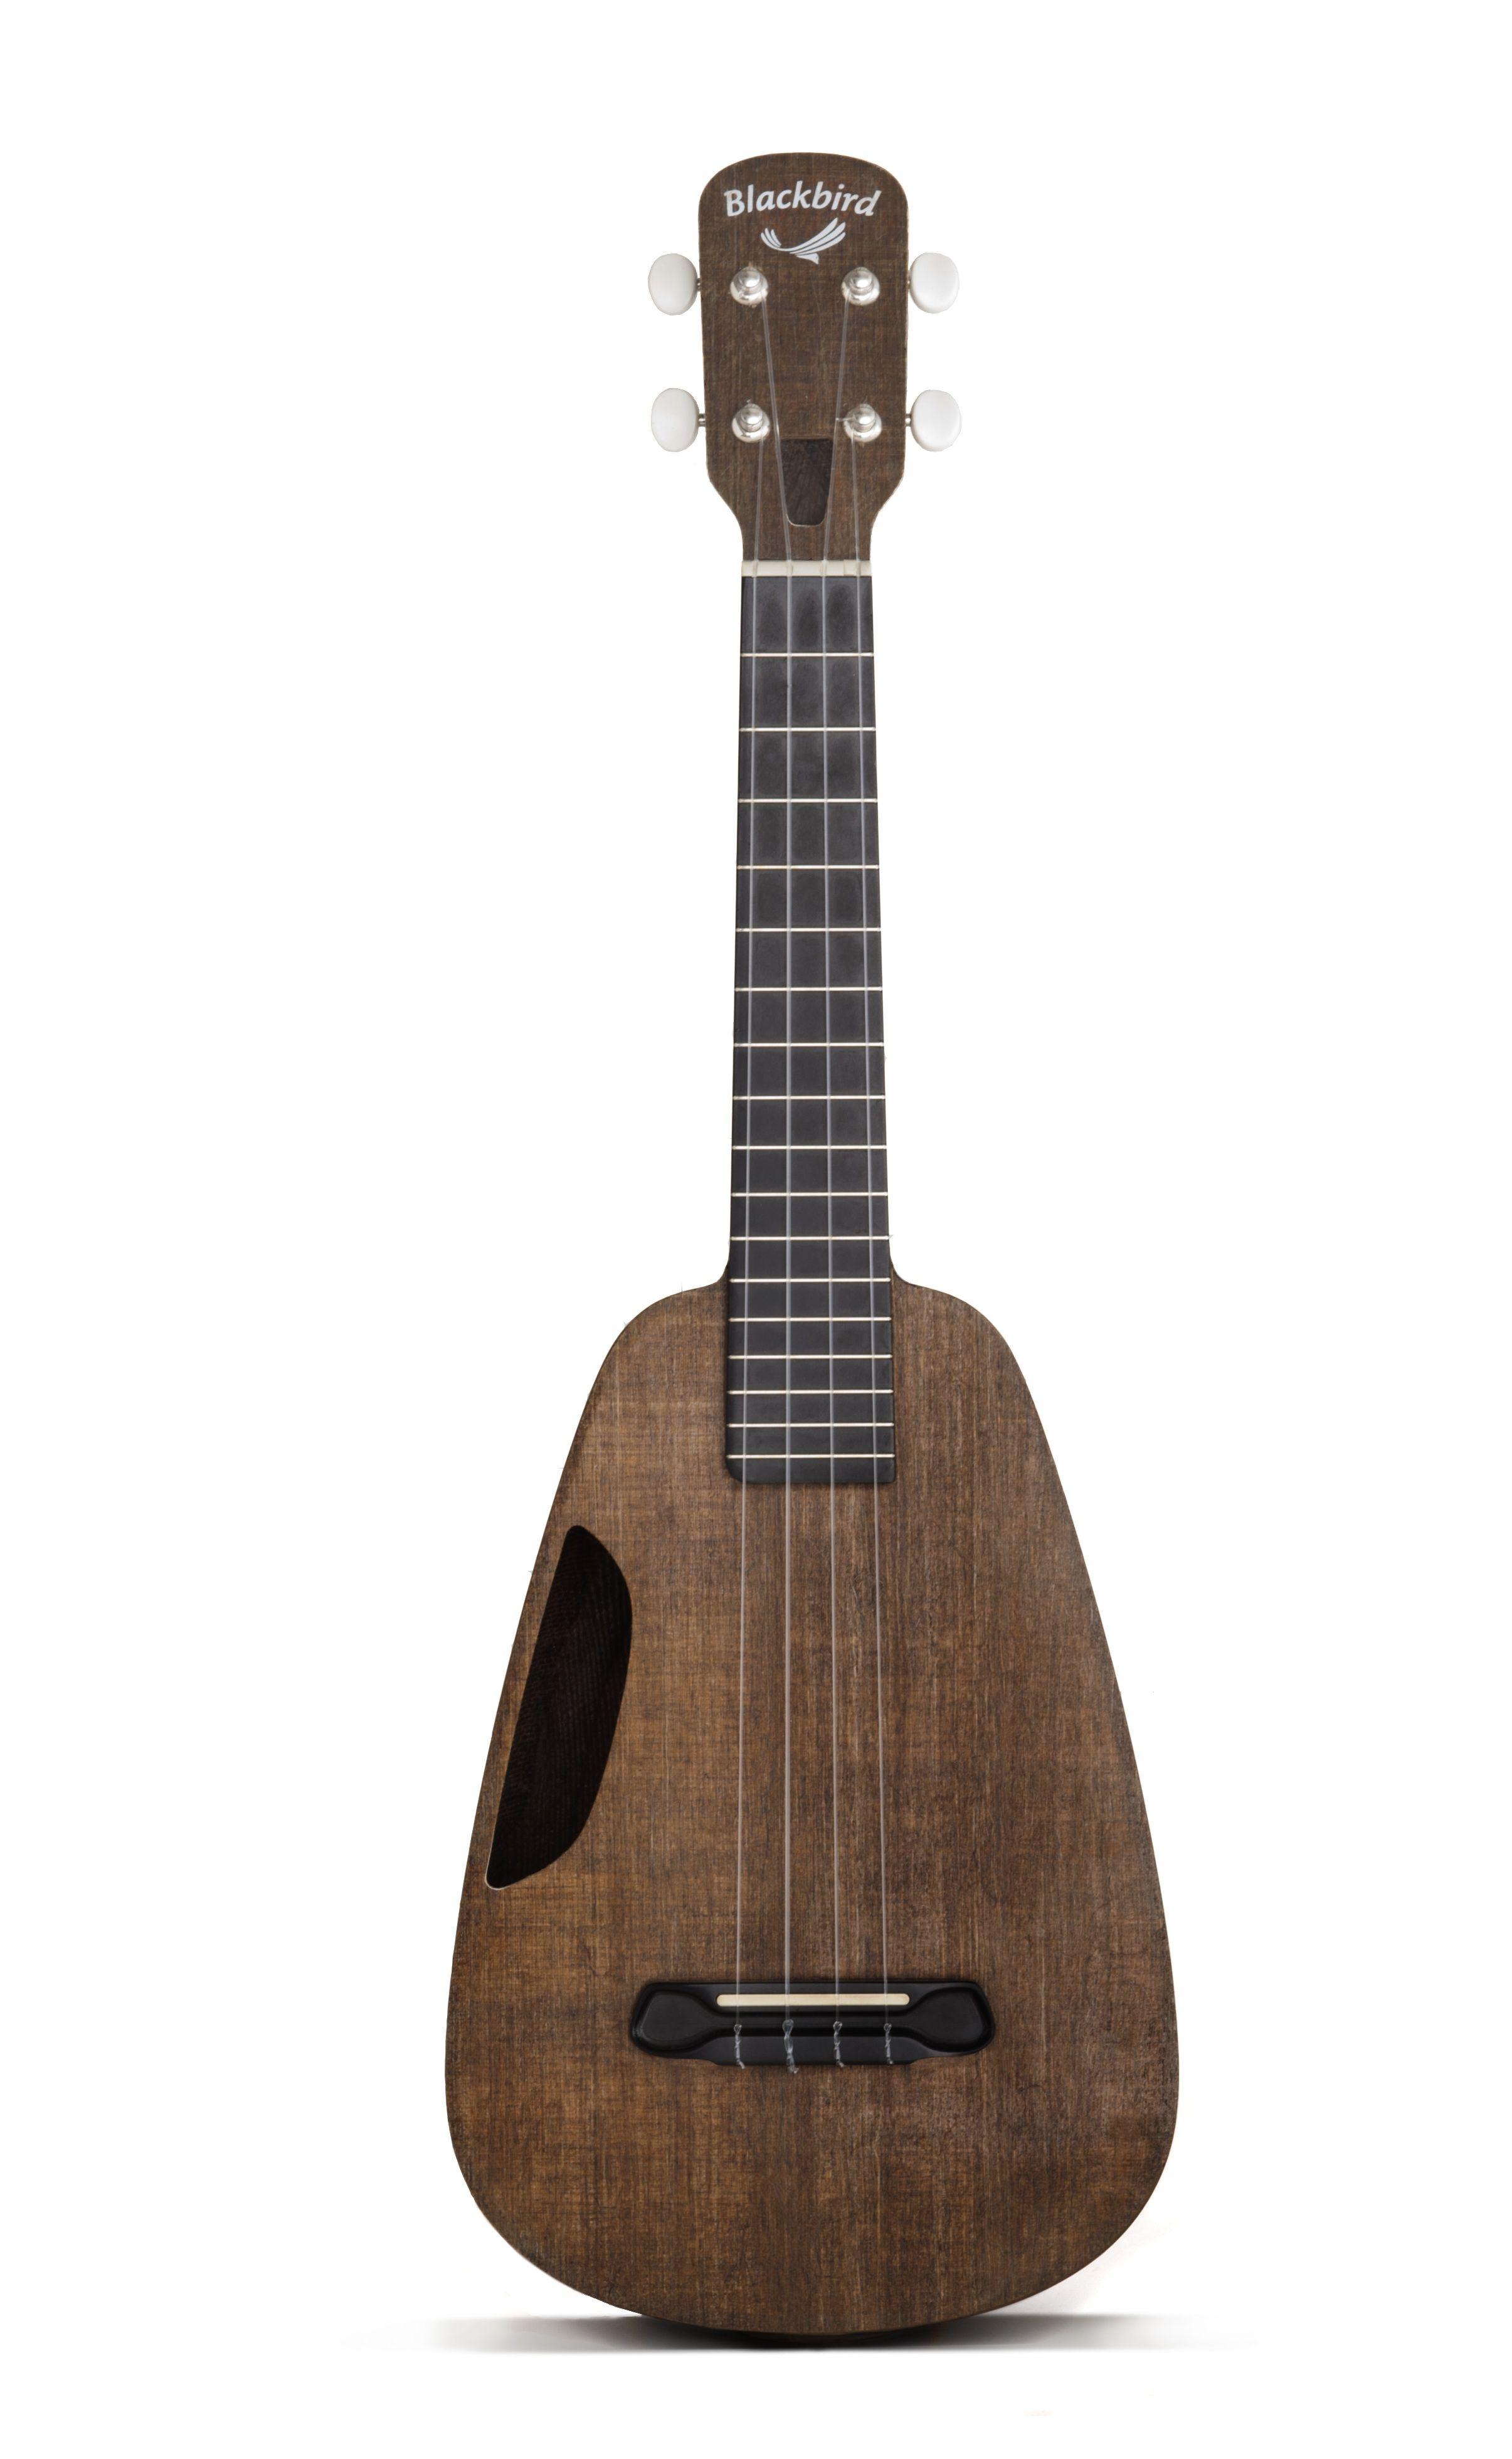 Blackbird Launches Clara, the World's First Concert-Level, Plant-Fiber Composite Instrument